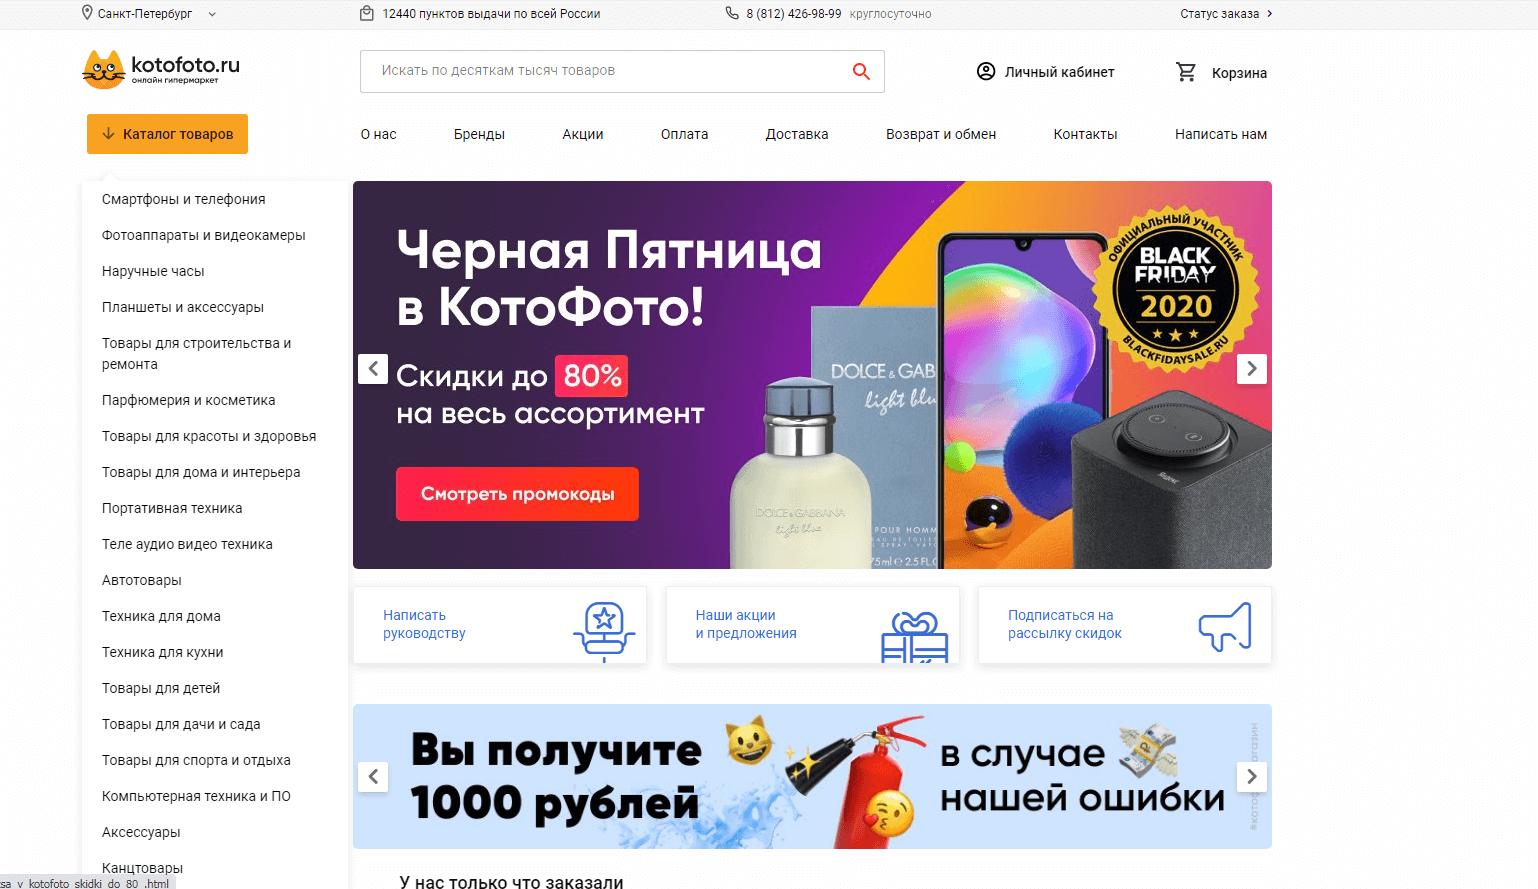 kotofoto.ru website